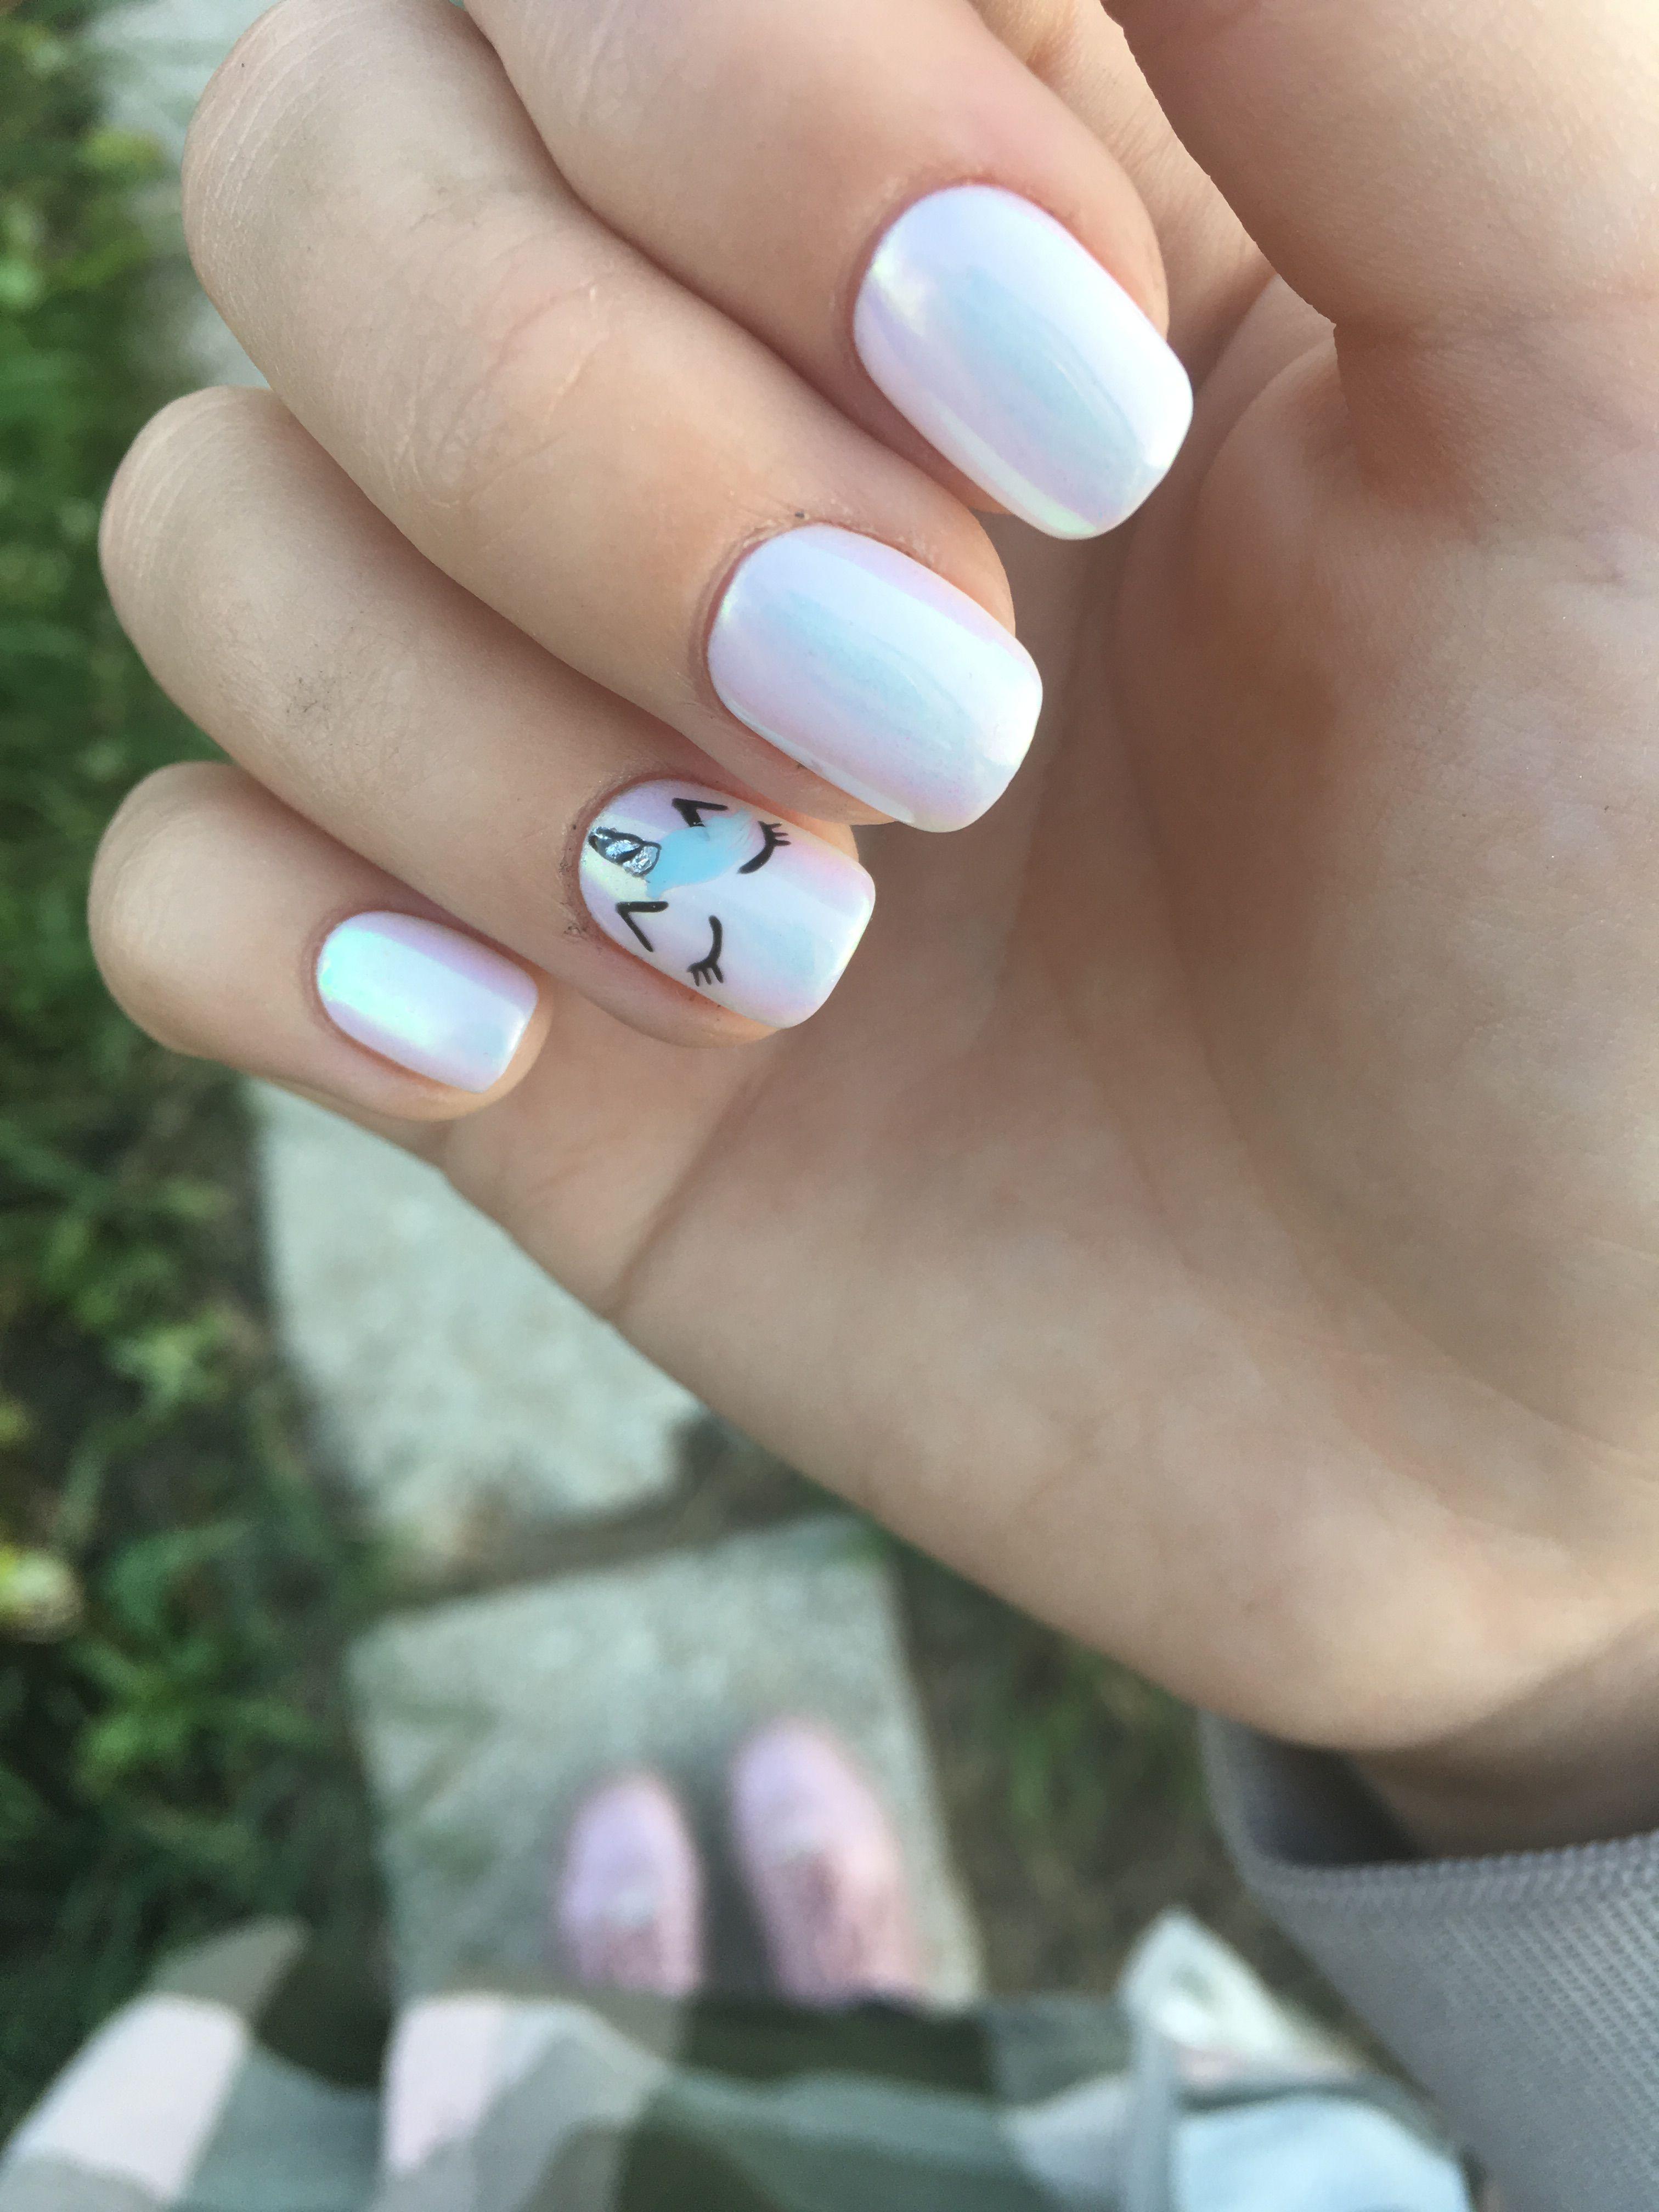 Magic nails | nails | Pinterest | Unicorns, Magic nails and Manicure